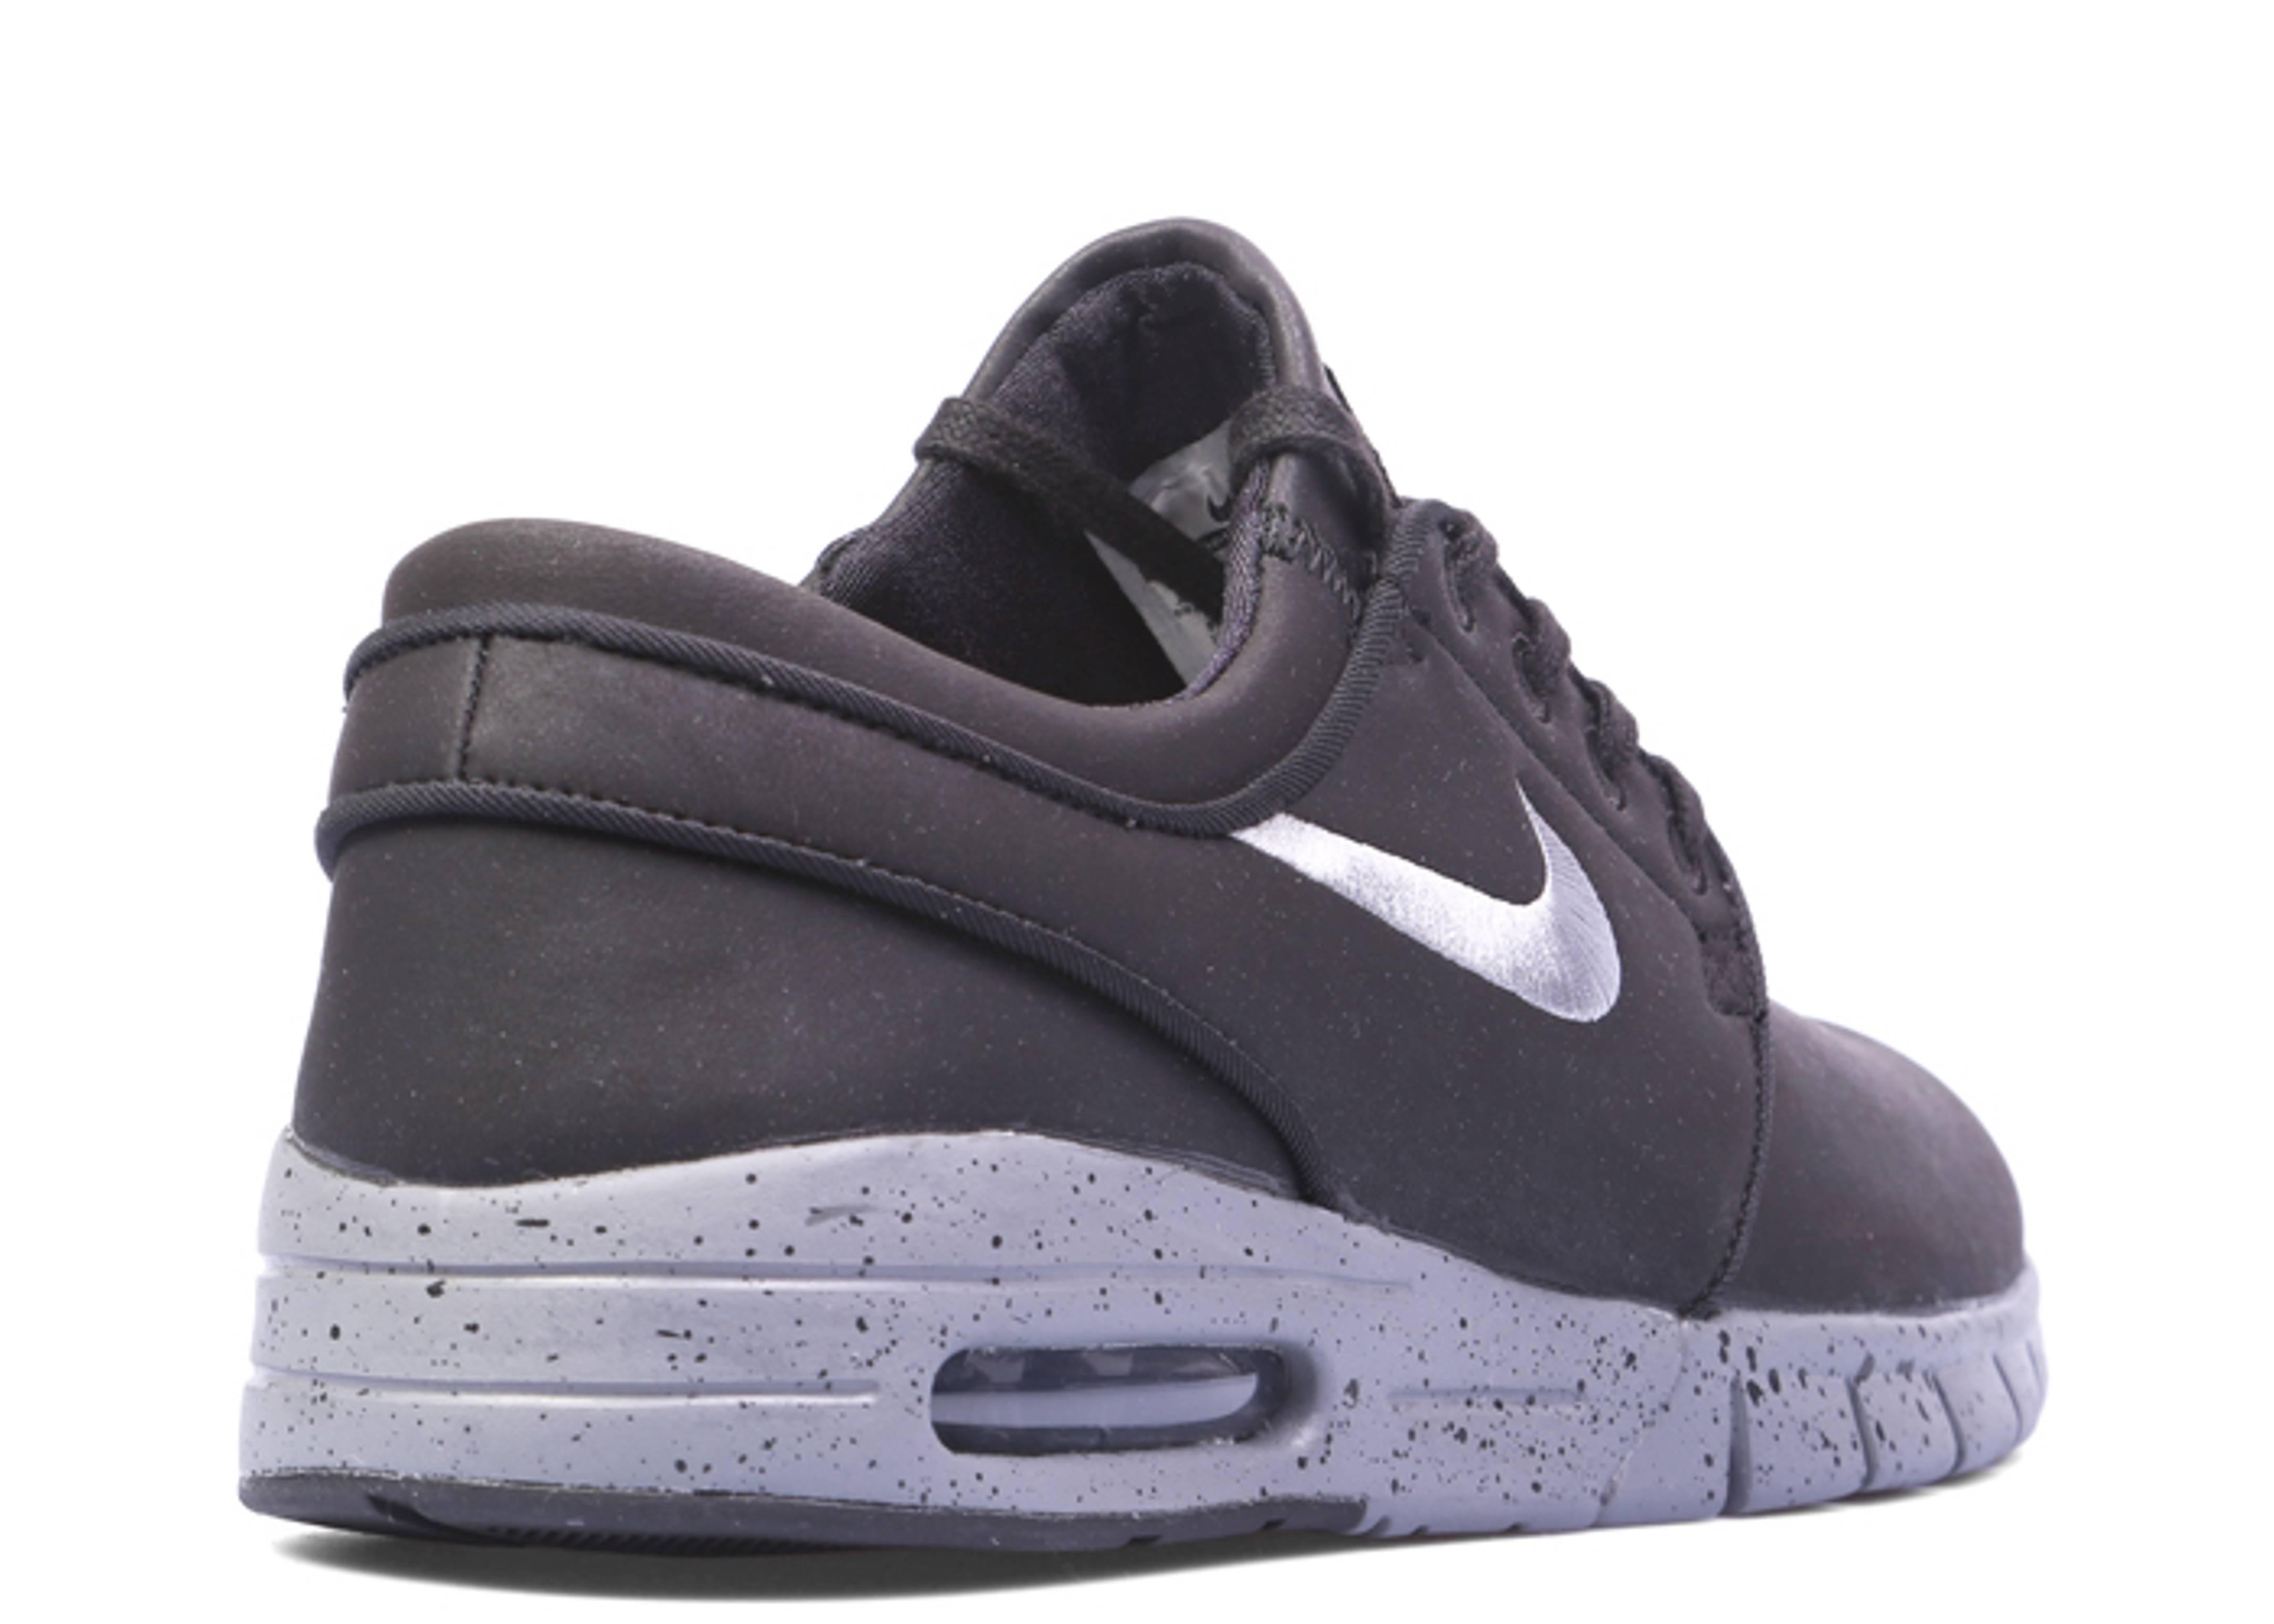 Nike Stefan Janoski New York